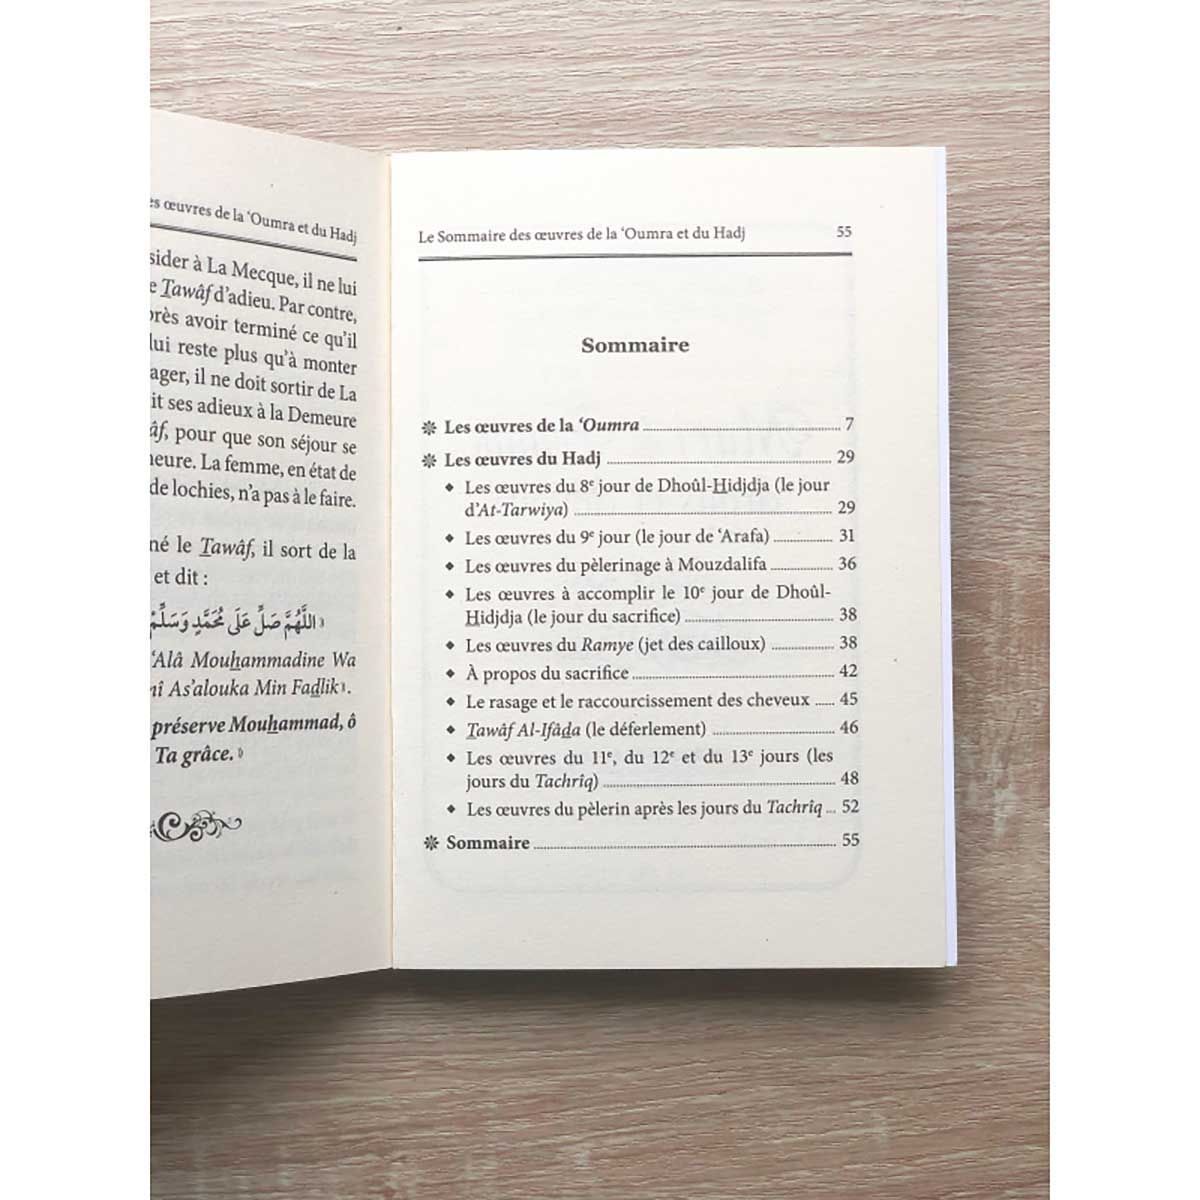 Le sommaire des oeuvres de la Omra et du Hajj - Cheikh Mohamed Ali Ferkous